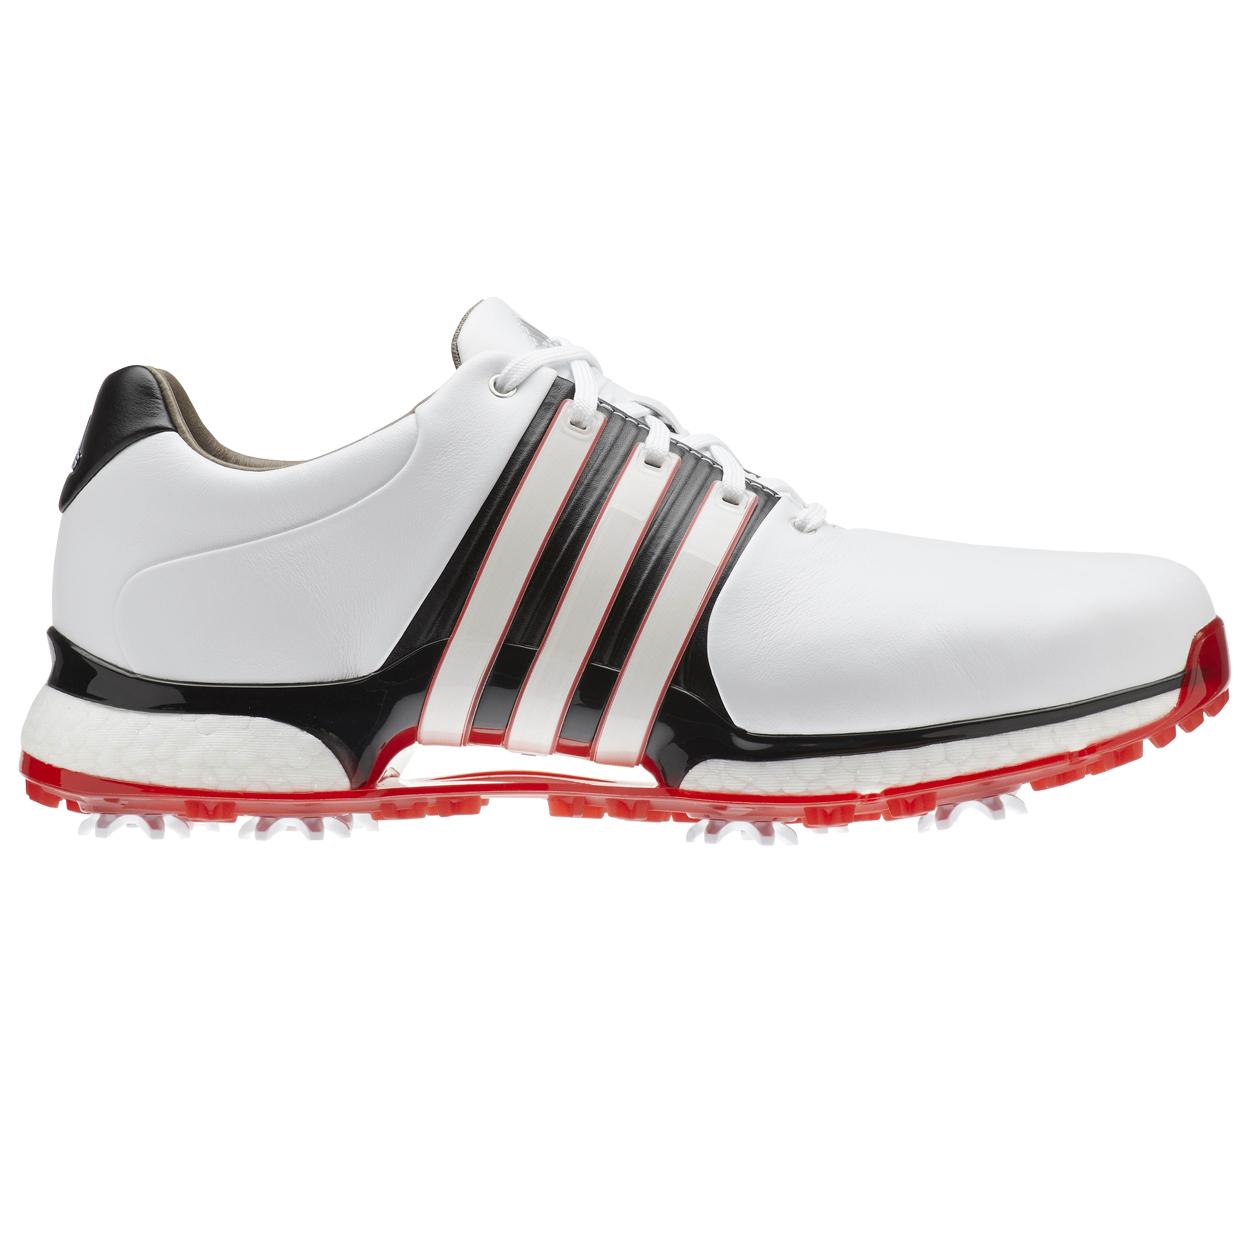 Adidas-Men-039-s-Tour-360-XT-Leather-Replaceable-Soft-Spike-Golf-Shoe-Brand-New thumbnail 10